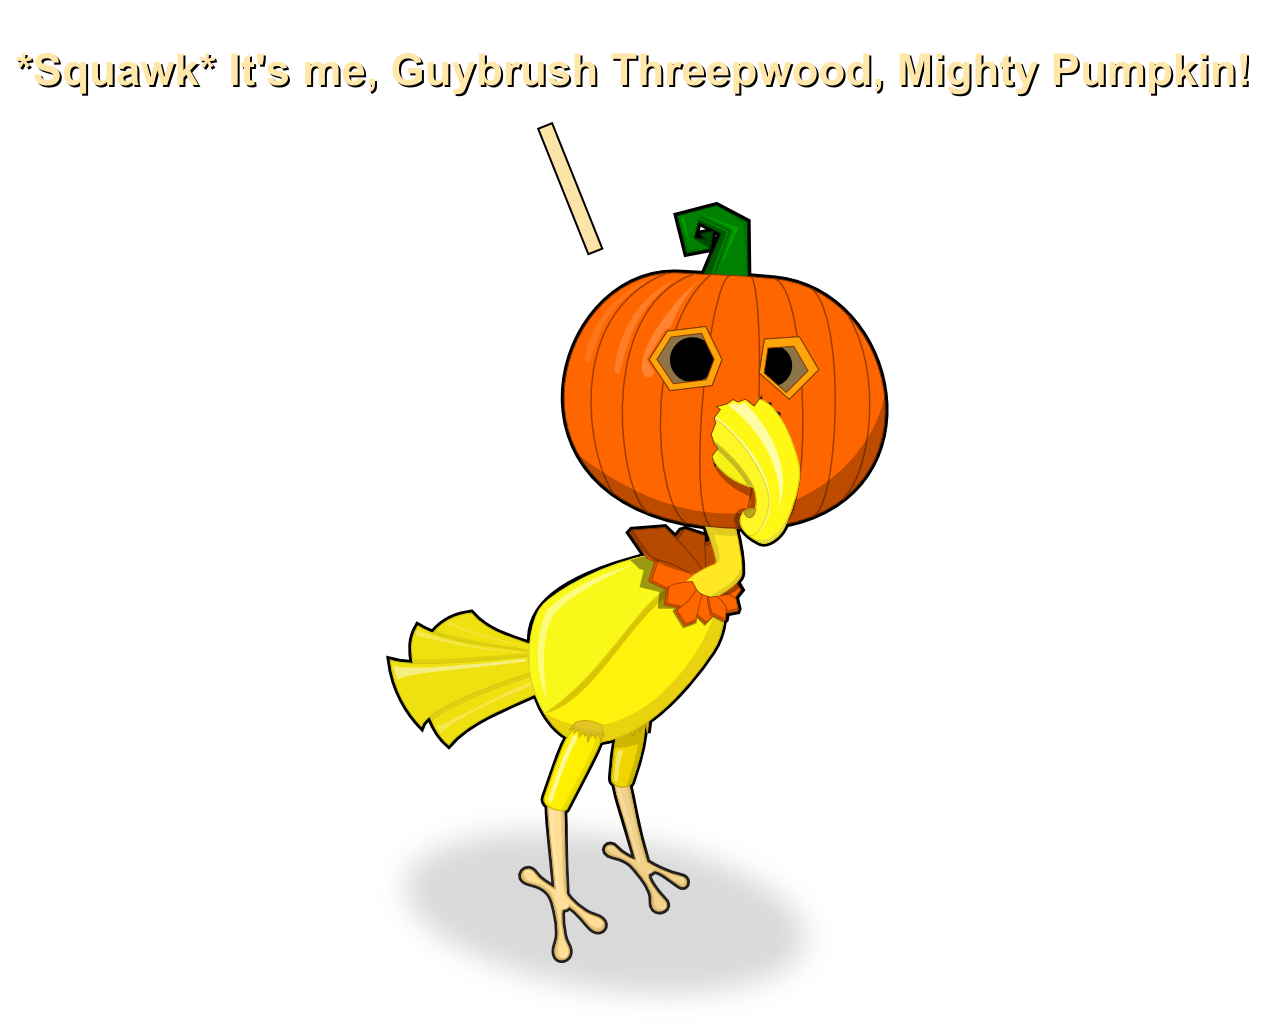 Mighty Pumpkin